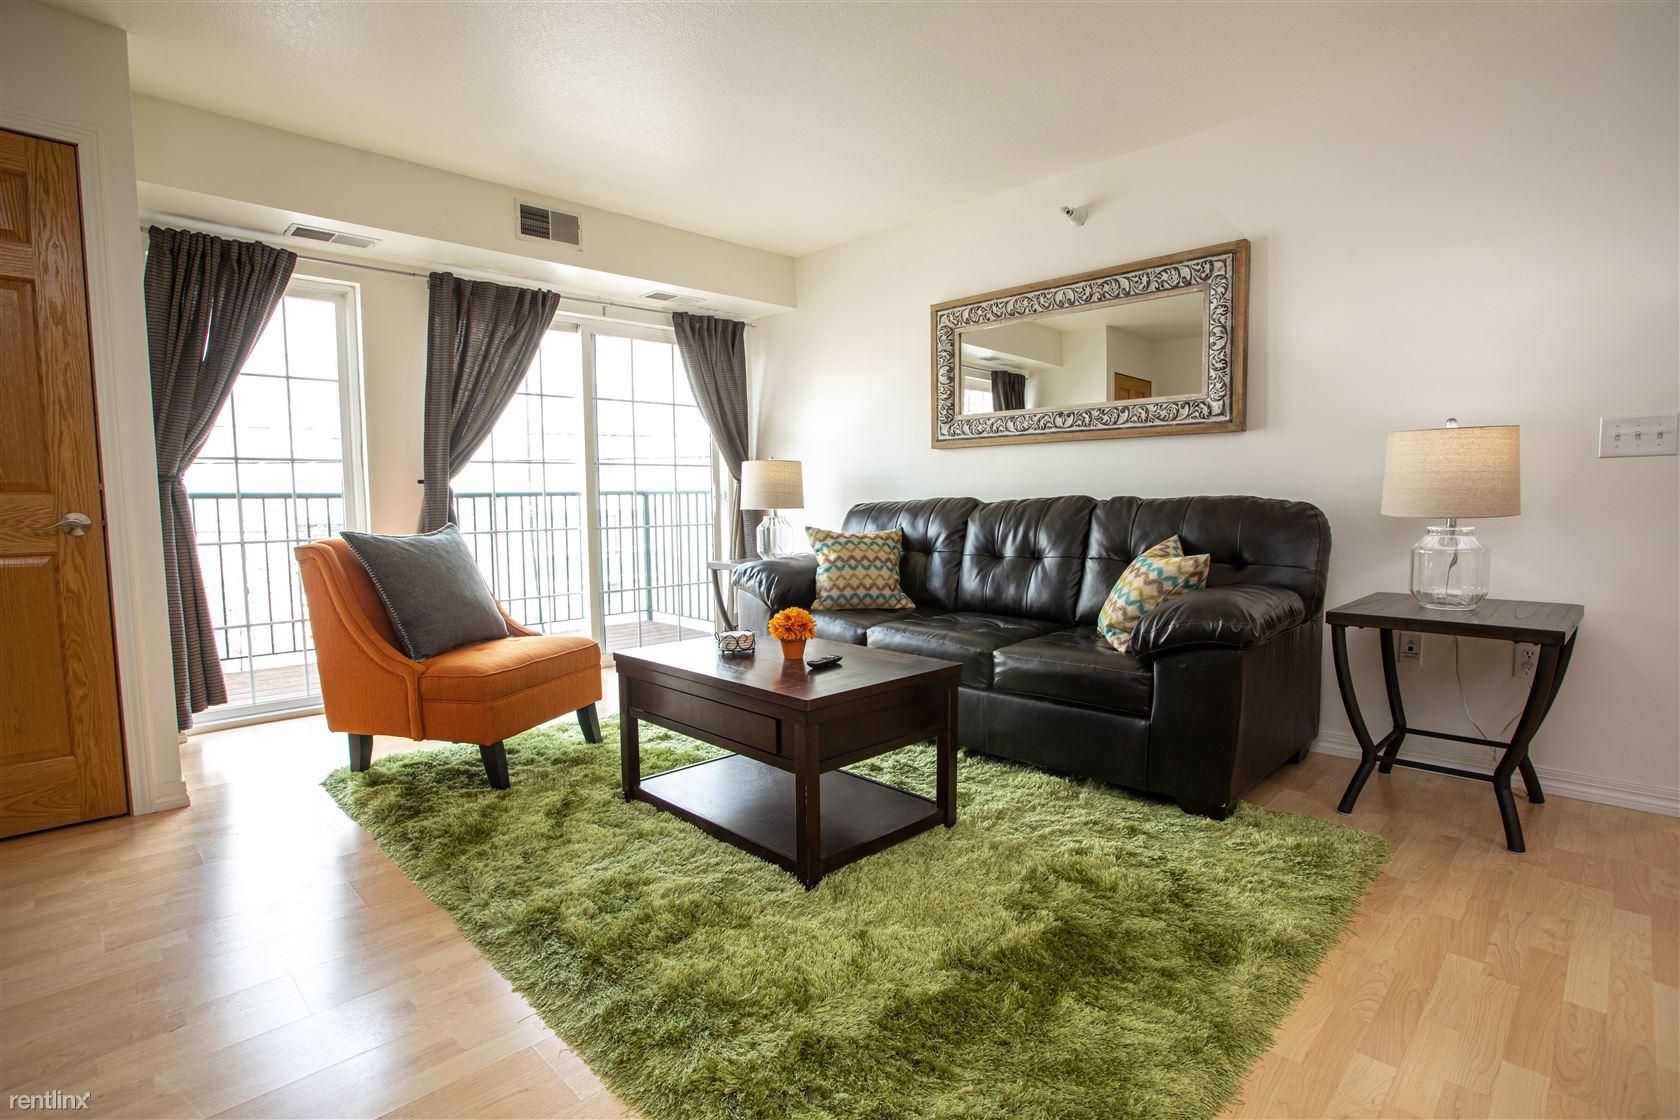 West Franklin Avenue & Lyndale Avenue South, Minneapolis, MN - $2,600